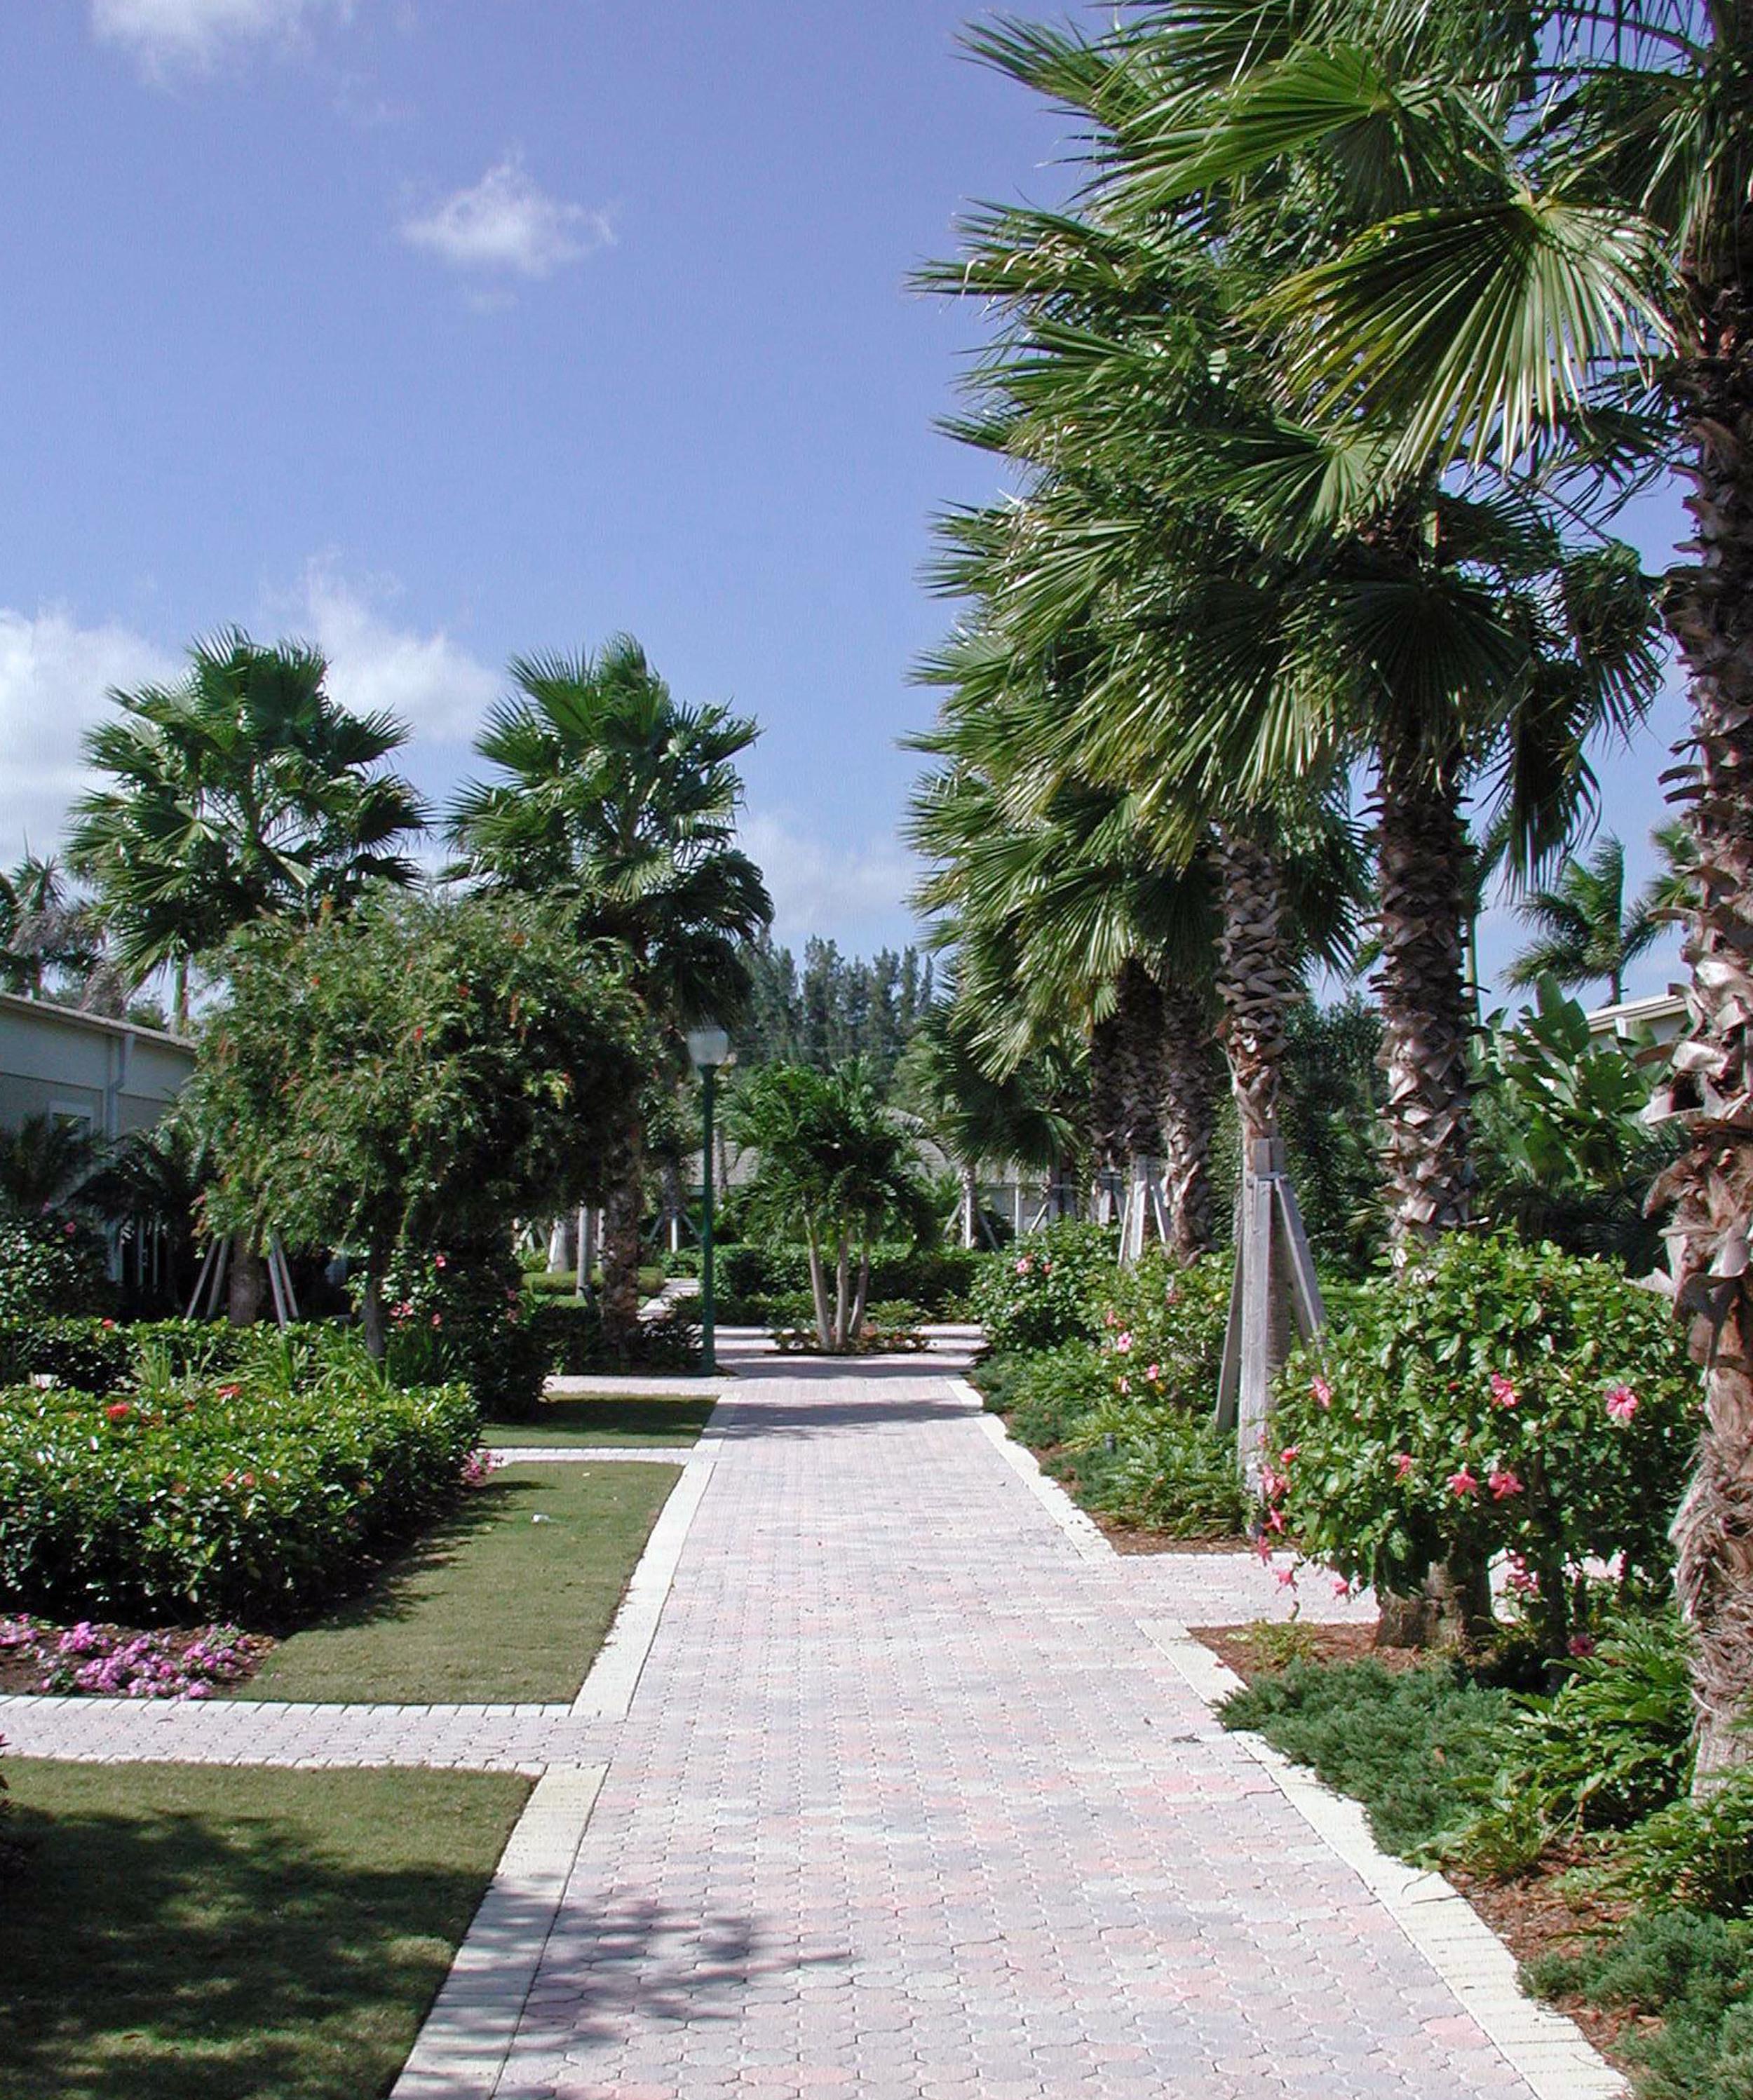 Tropical Formal Landscape at Christ Fellowship Church Landscaping PBG.JPG